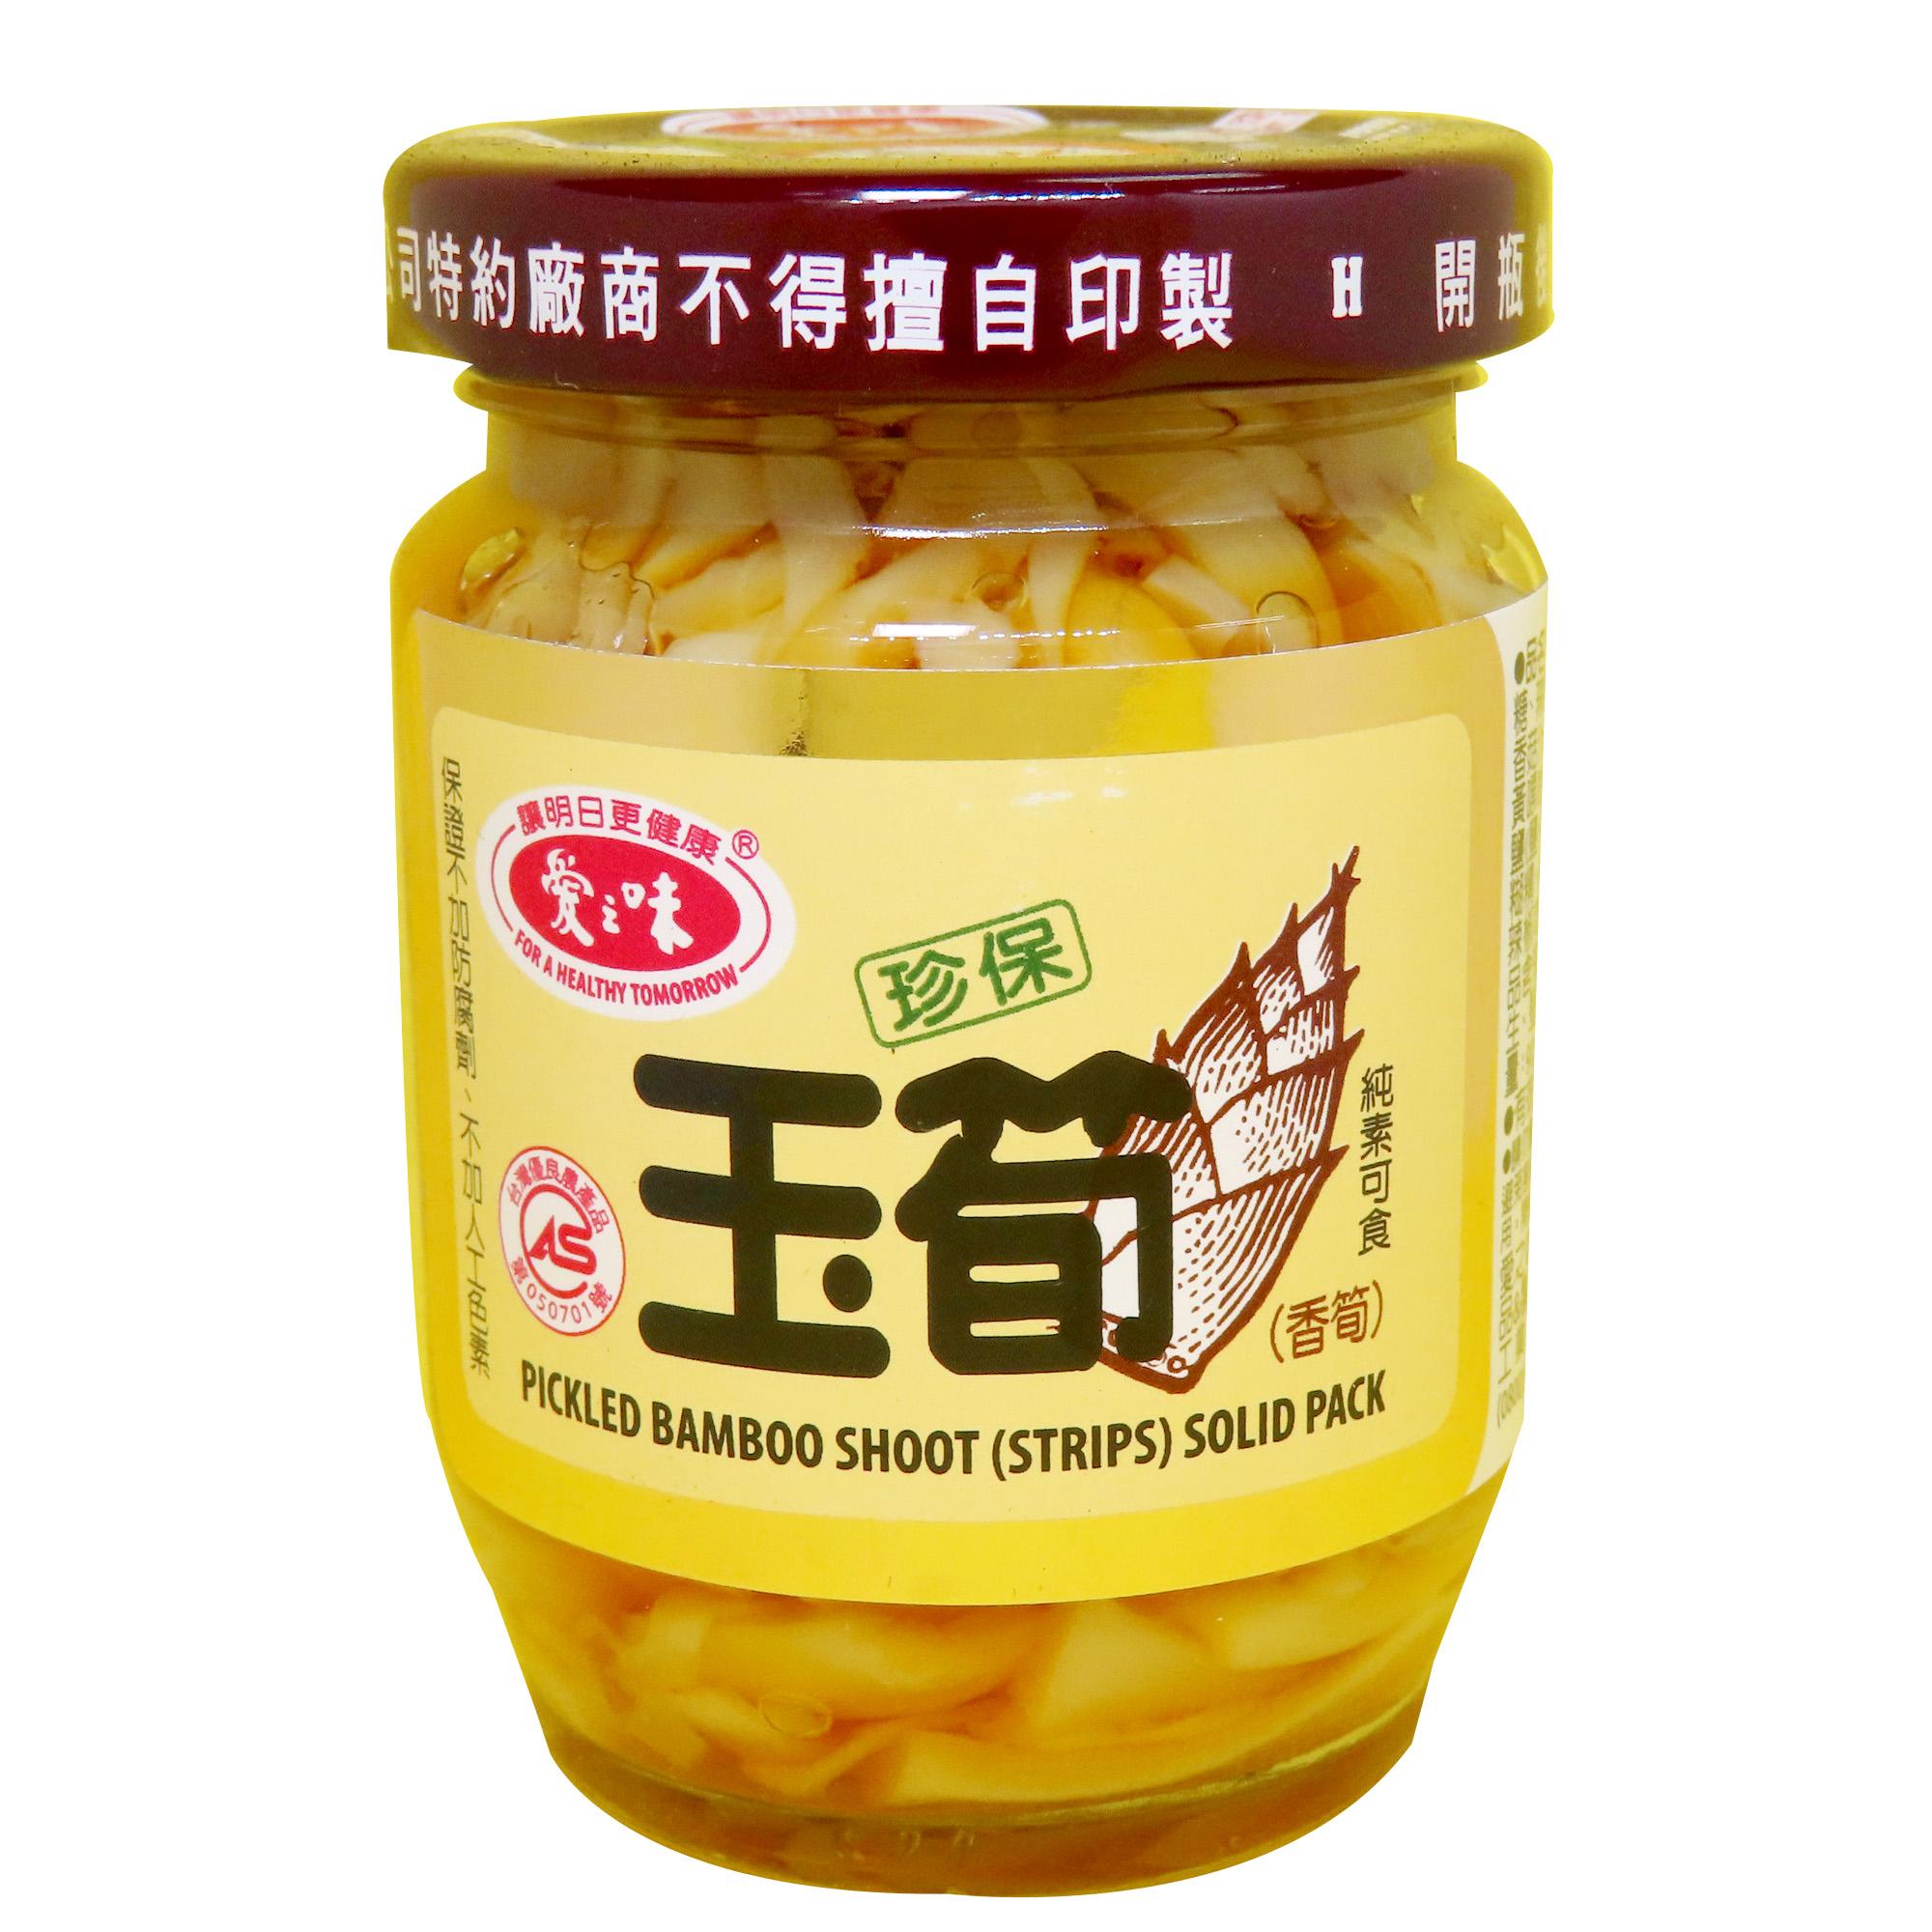 Image Pickled Bamboo Shoot 爱之味 - 珍保玉筍 120 grams